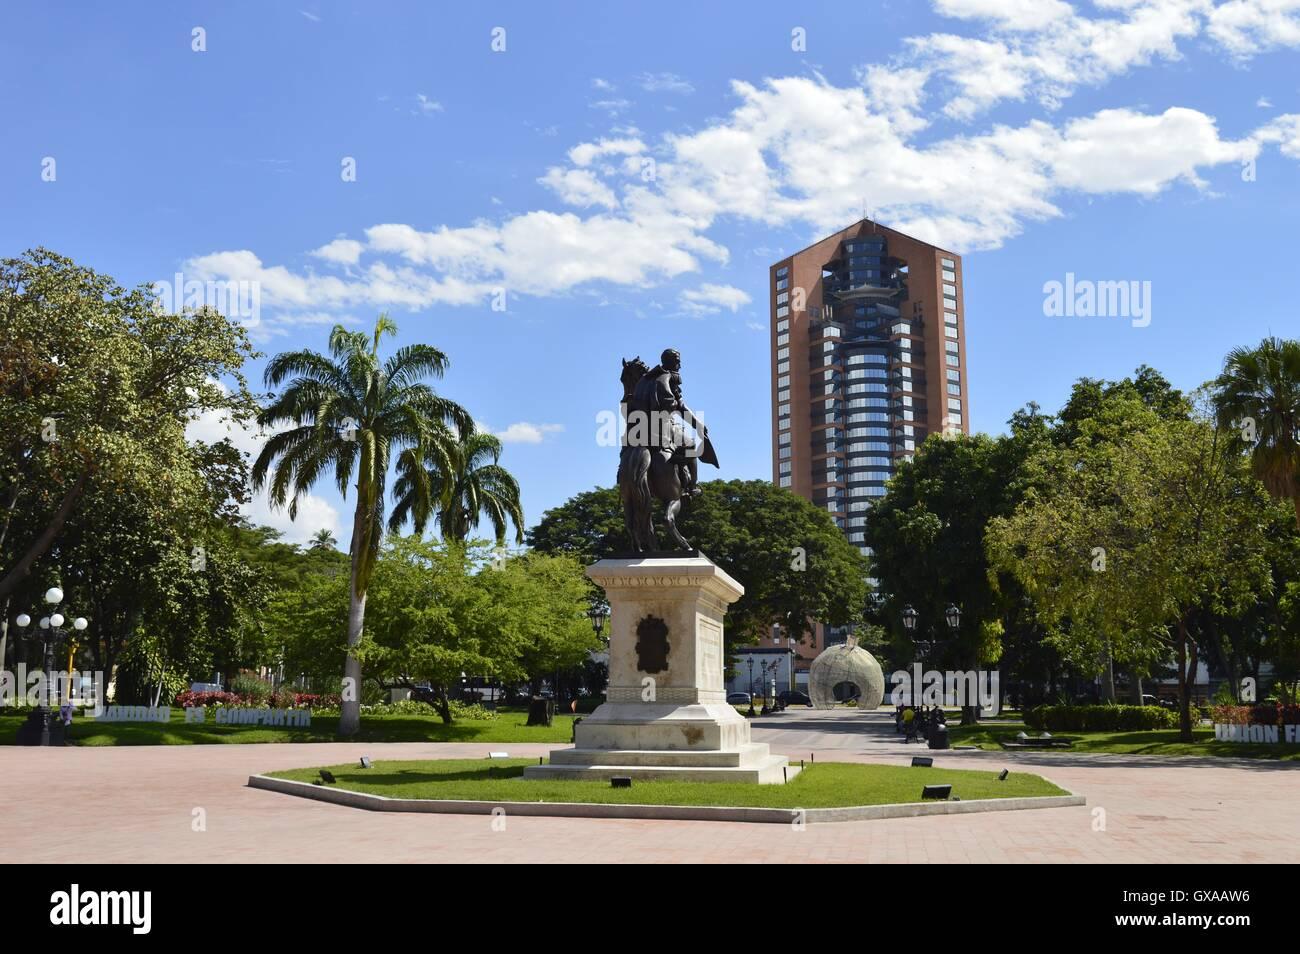 Simon Bolivar Square, in Maracay, Venezuela. - Stock Image